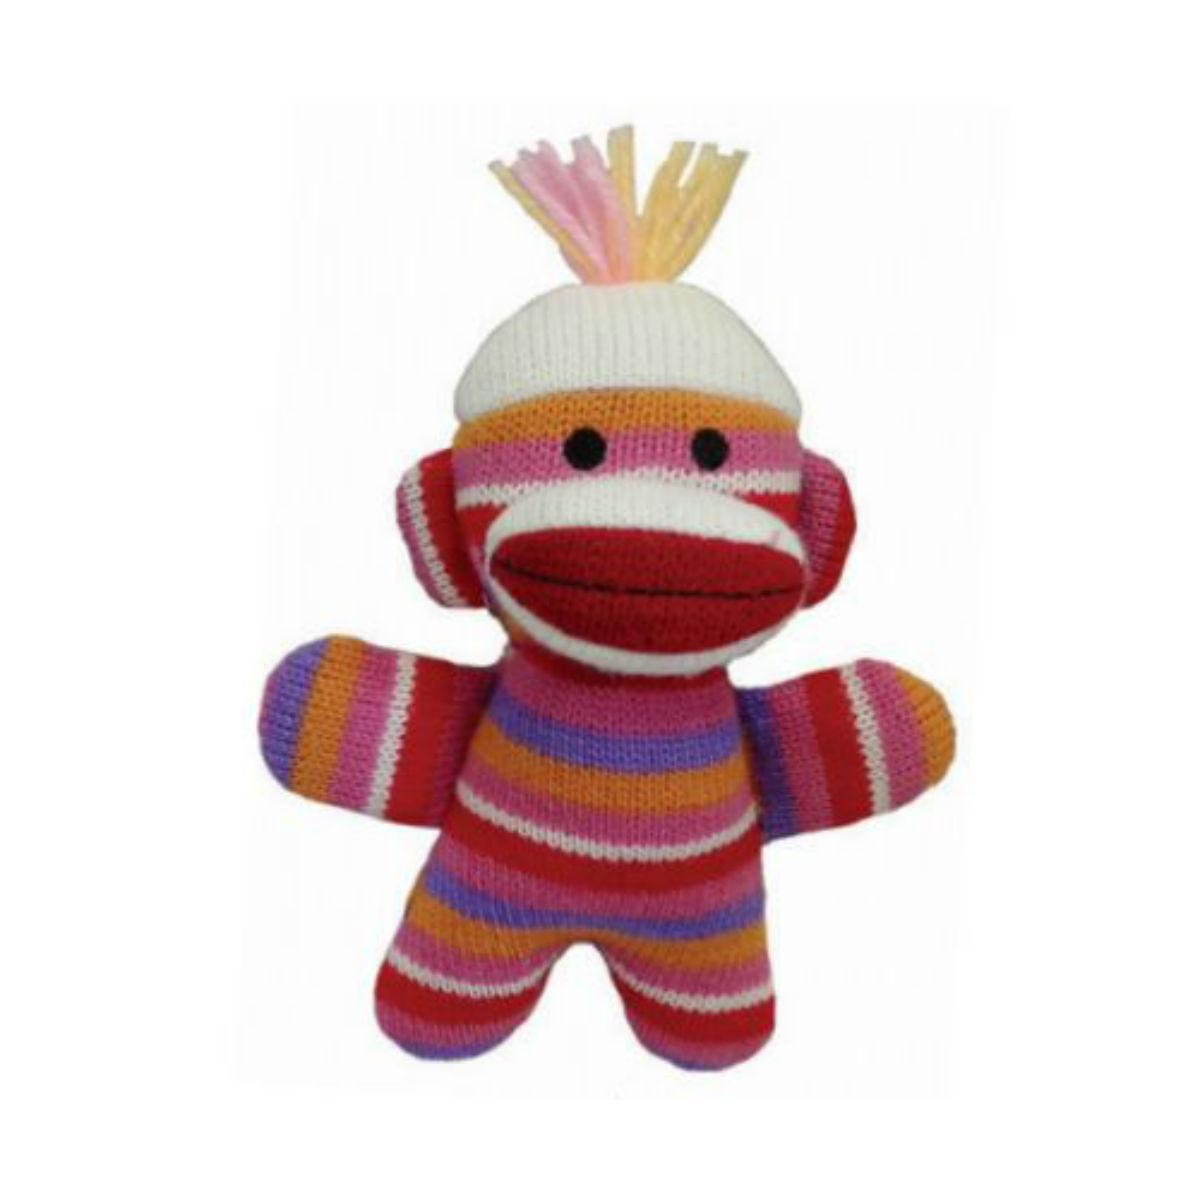 Lulubelles Power Plush Dog Toy - Sock Monkey Baby Kitty